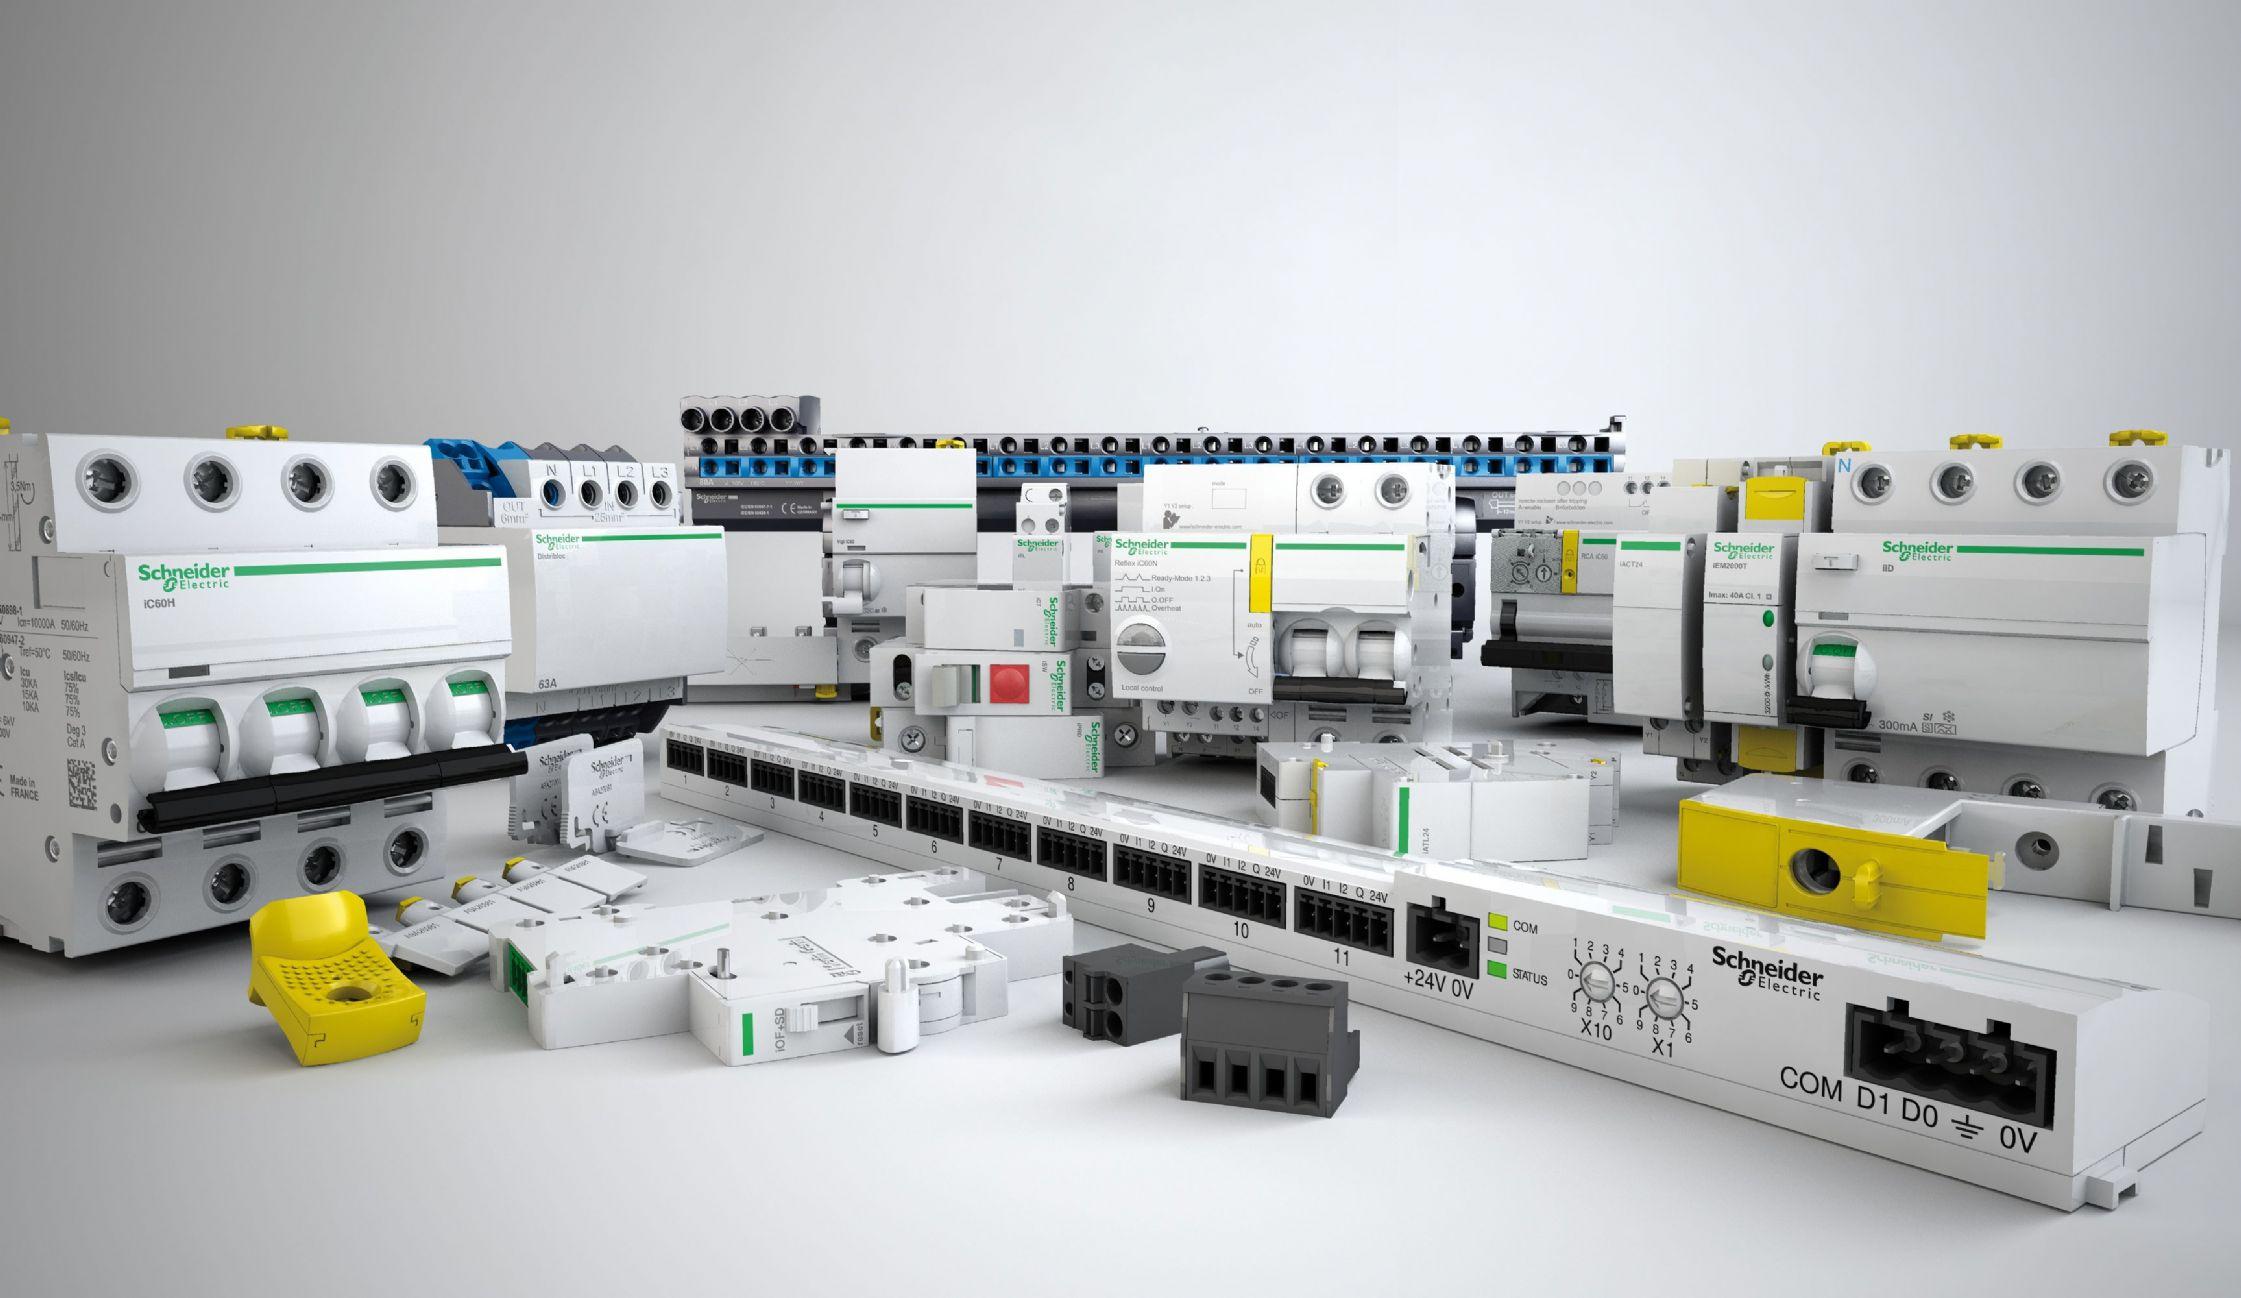 Building Automation Control Components